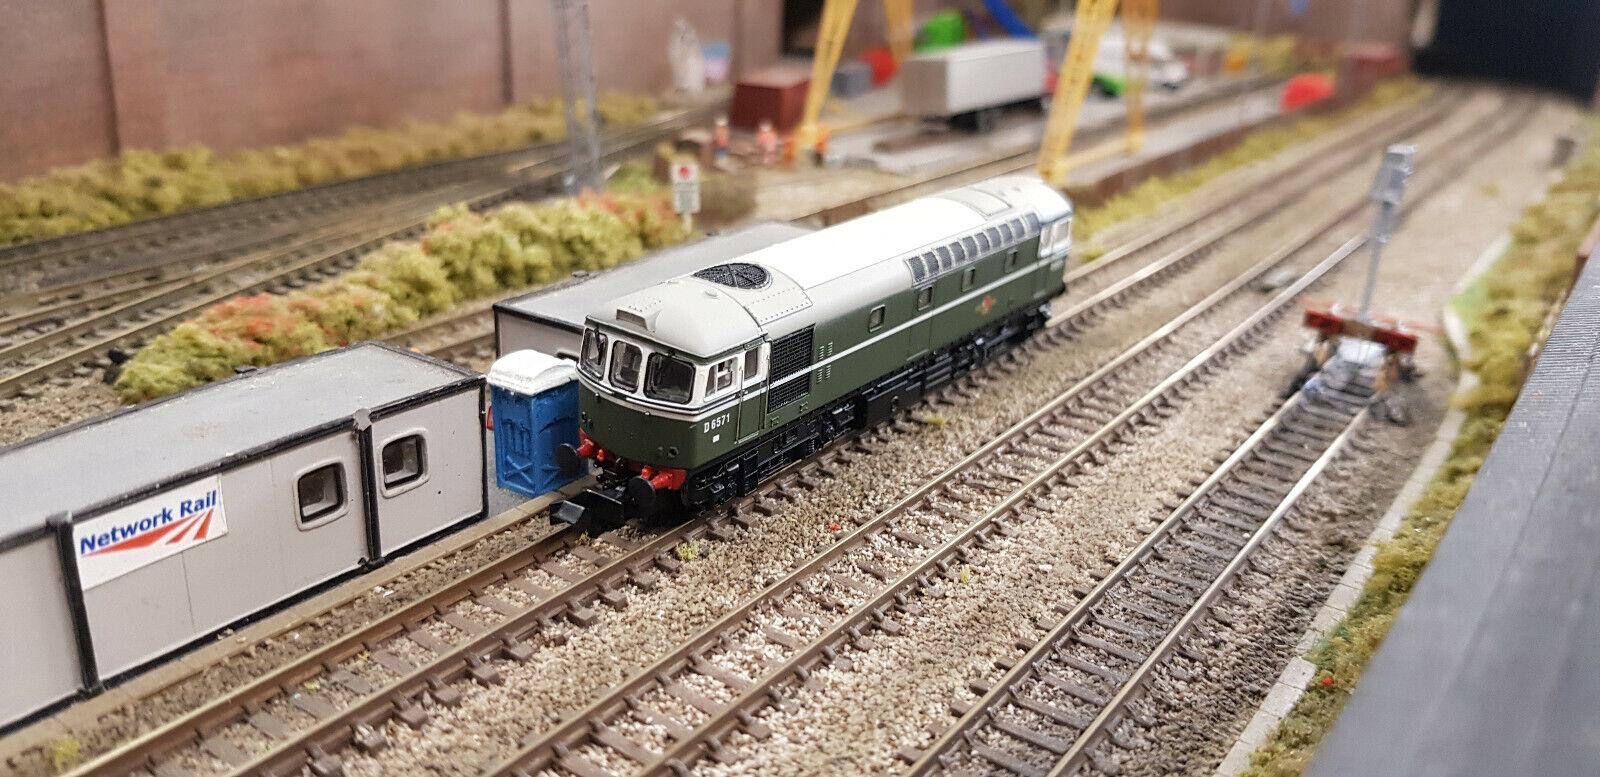 Dapol 2D001001 classe 33 D6571 BR verde No Warning Panel